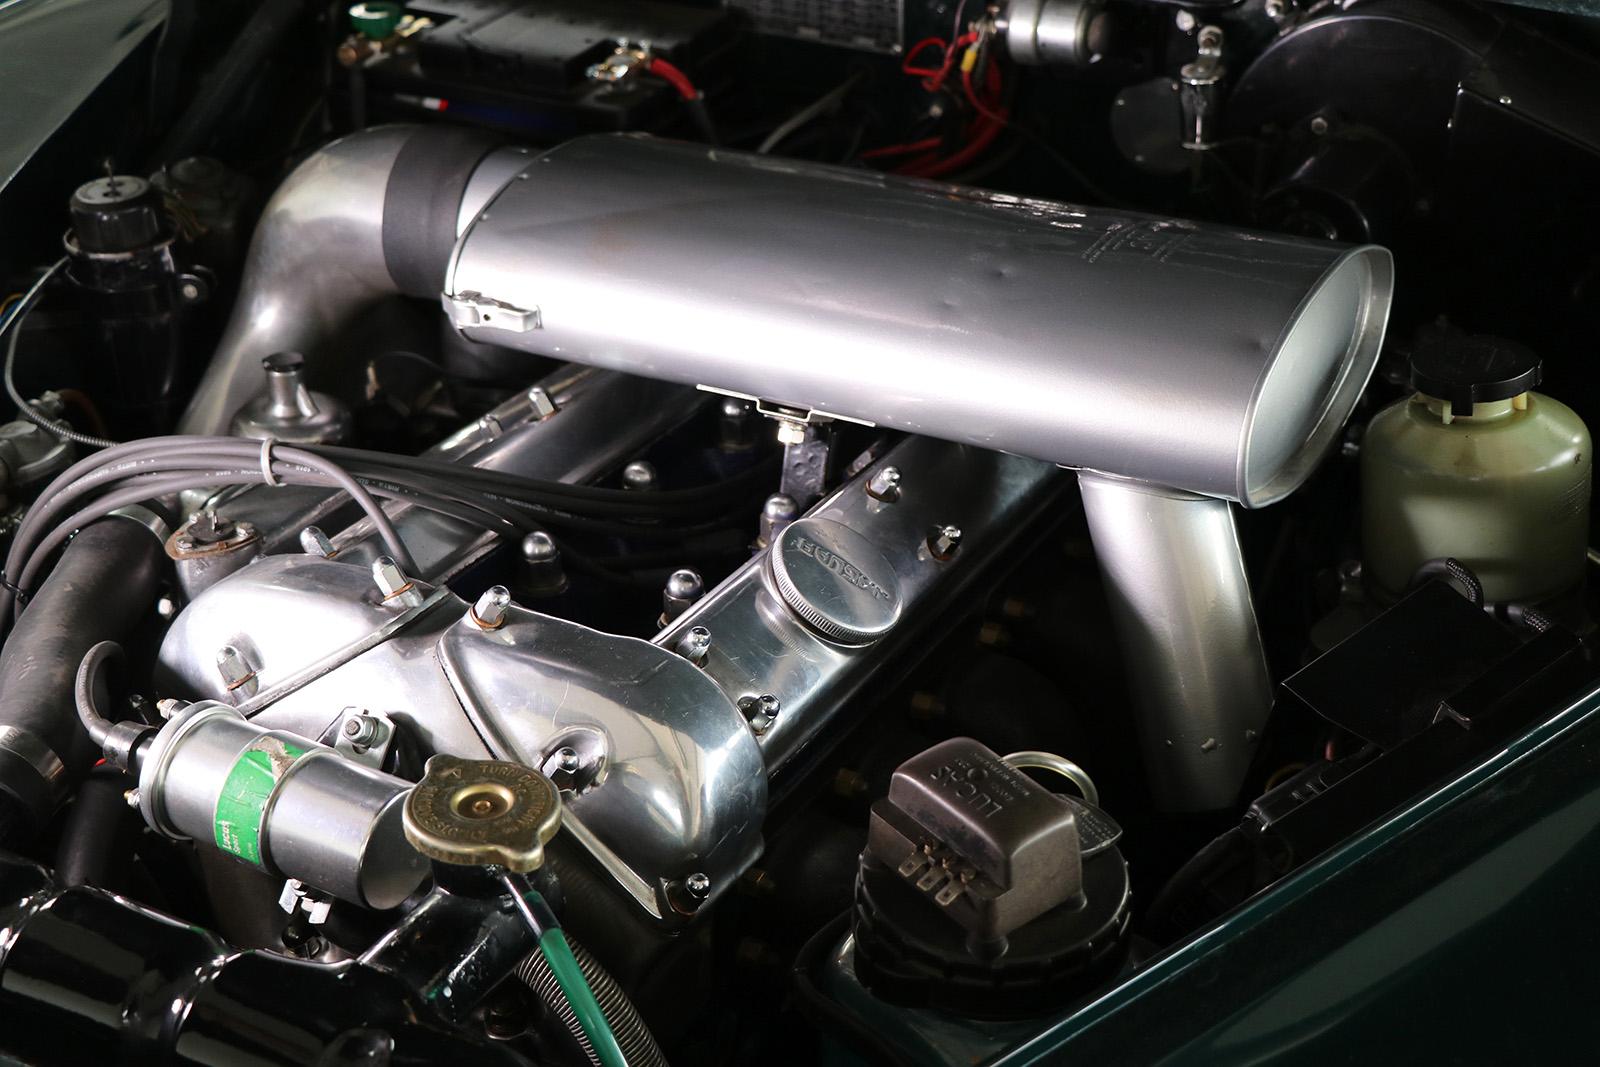 1959_Jaguar_Mark 1_sayer selection_duncan hamilton_lady cheatham_18_web.jpg